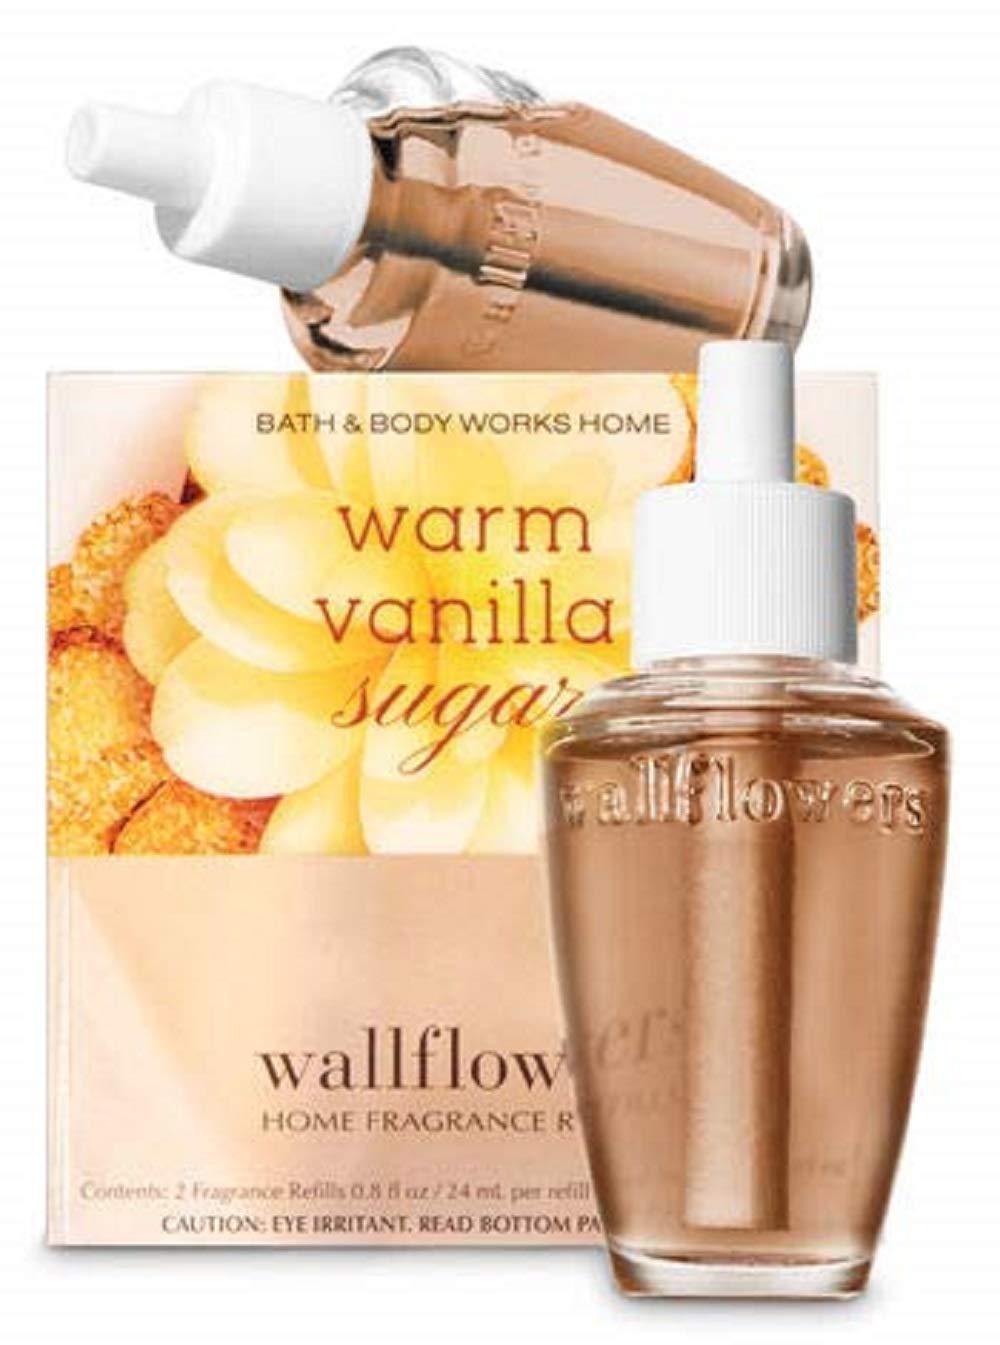 Warm Vanilla Sugar Wallflowers Fragrance Bulbs 2 pk - .8 oz each- by The White Barn Candle Co.